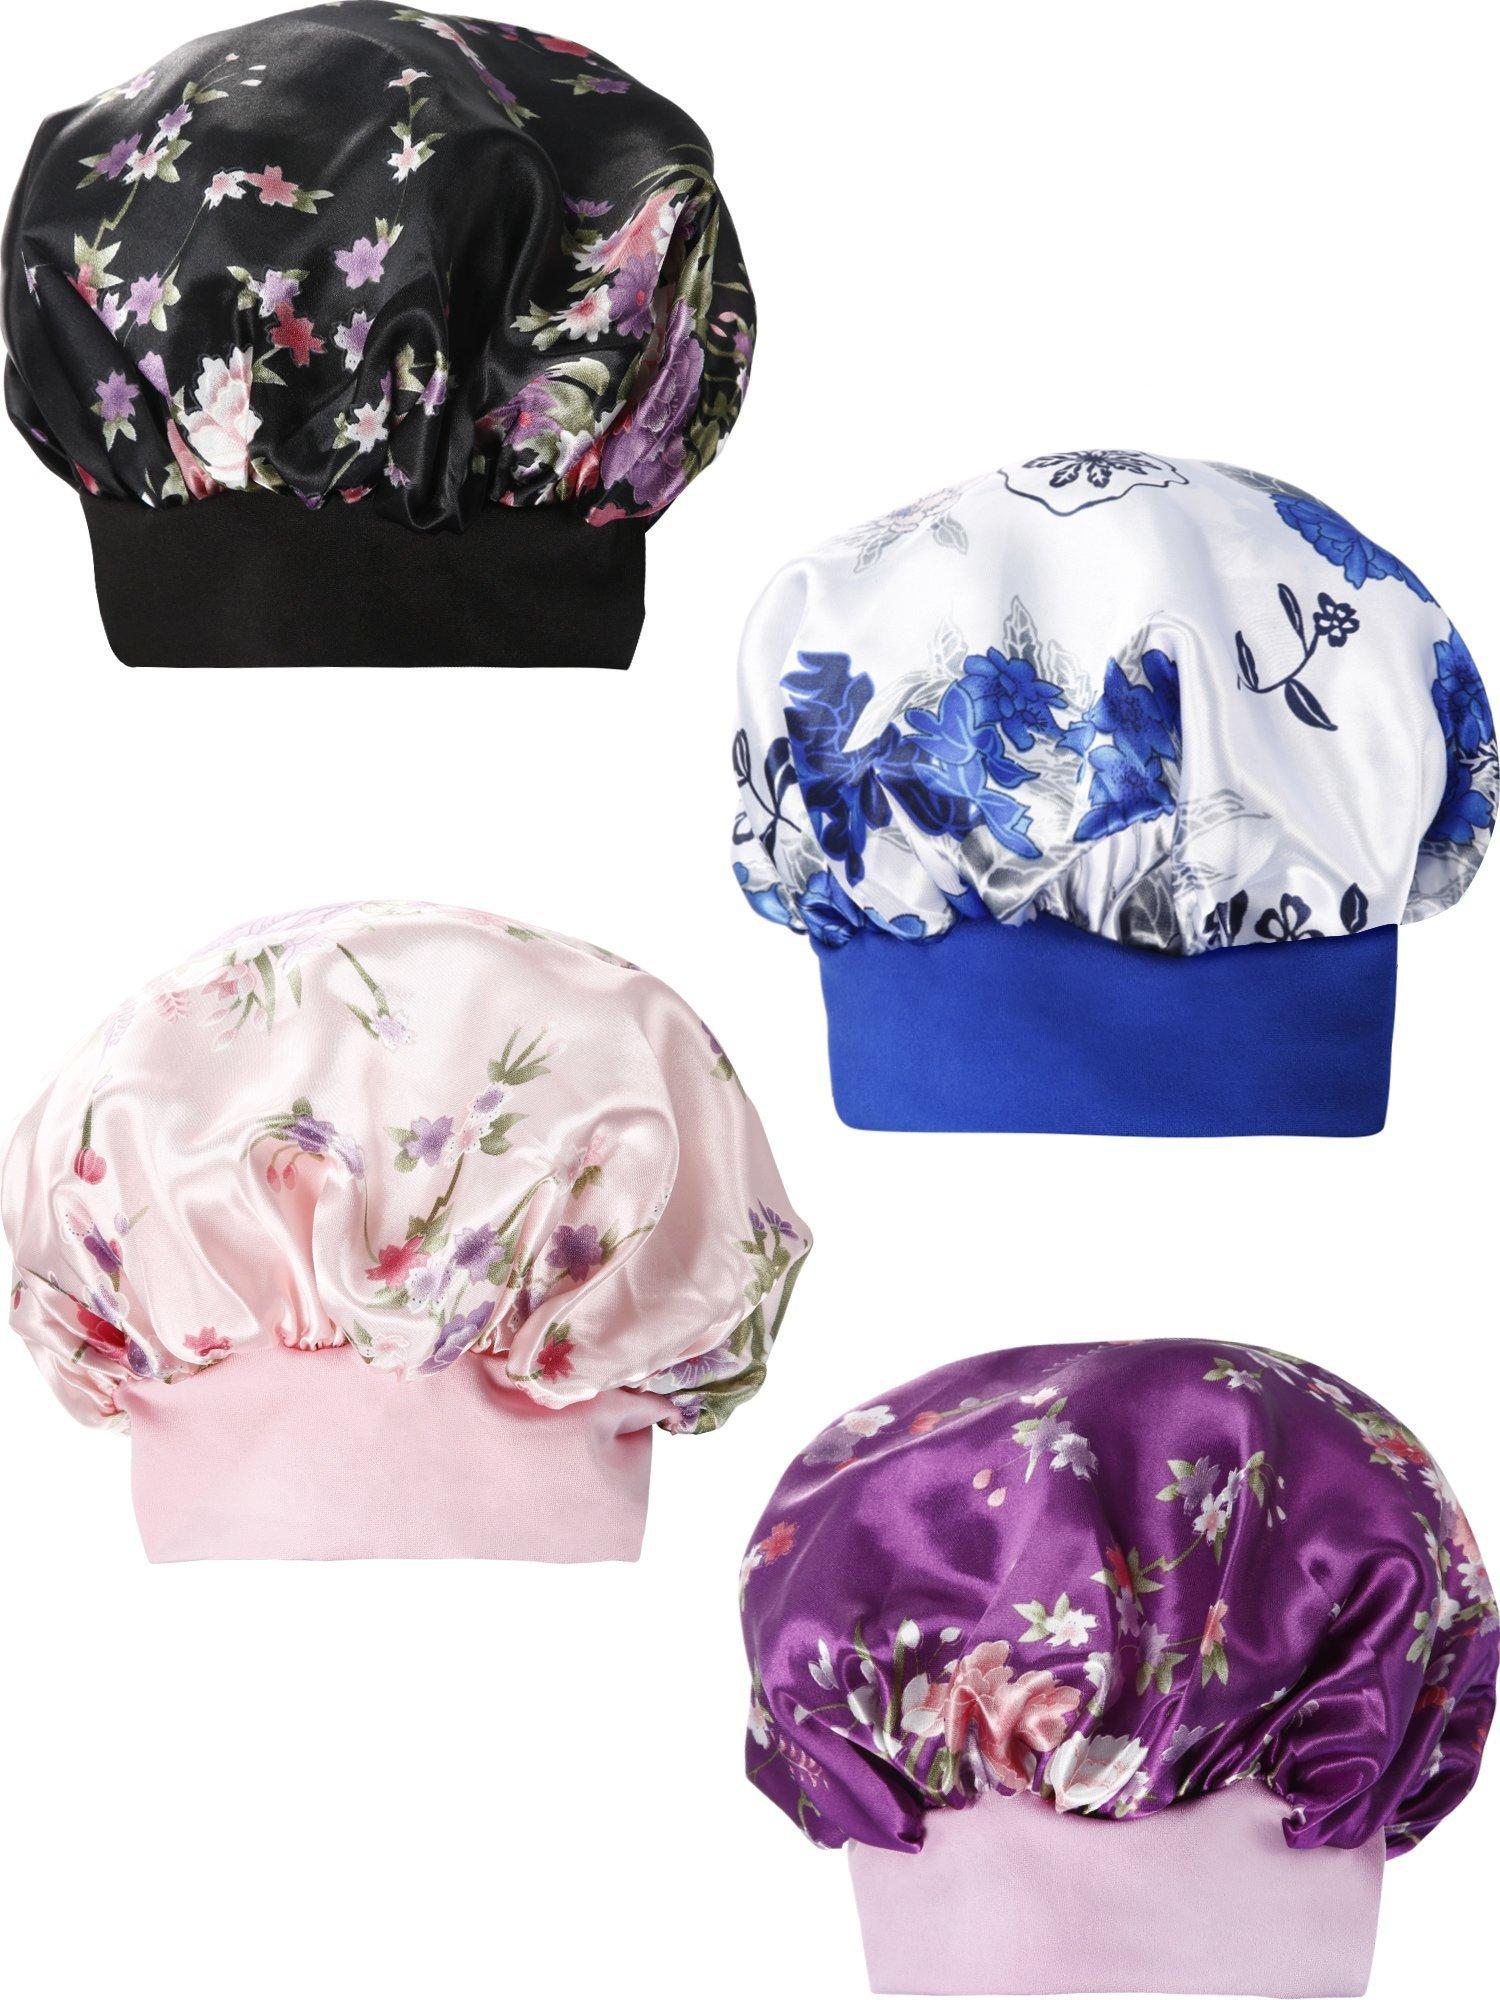 Galleon - SATINIOR 4 Pieces Soft Satin Sleeping Cap Salon Bonnet